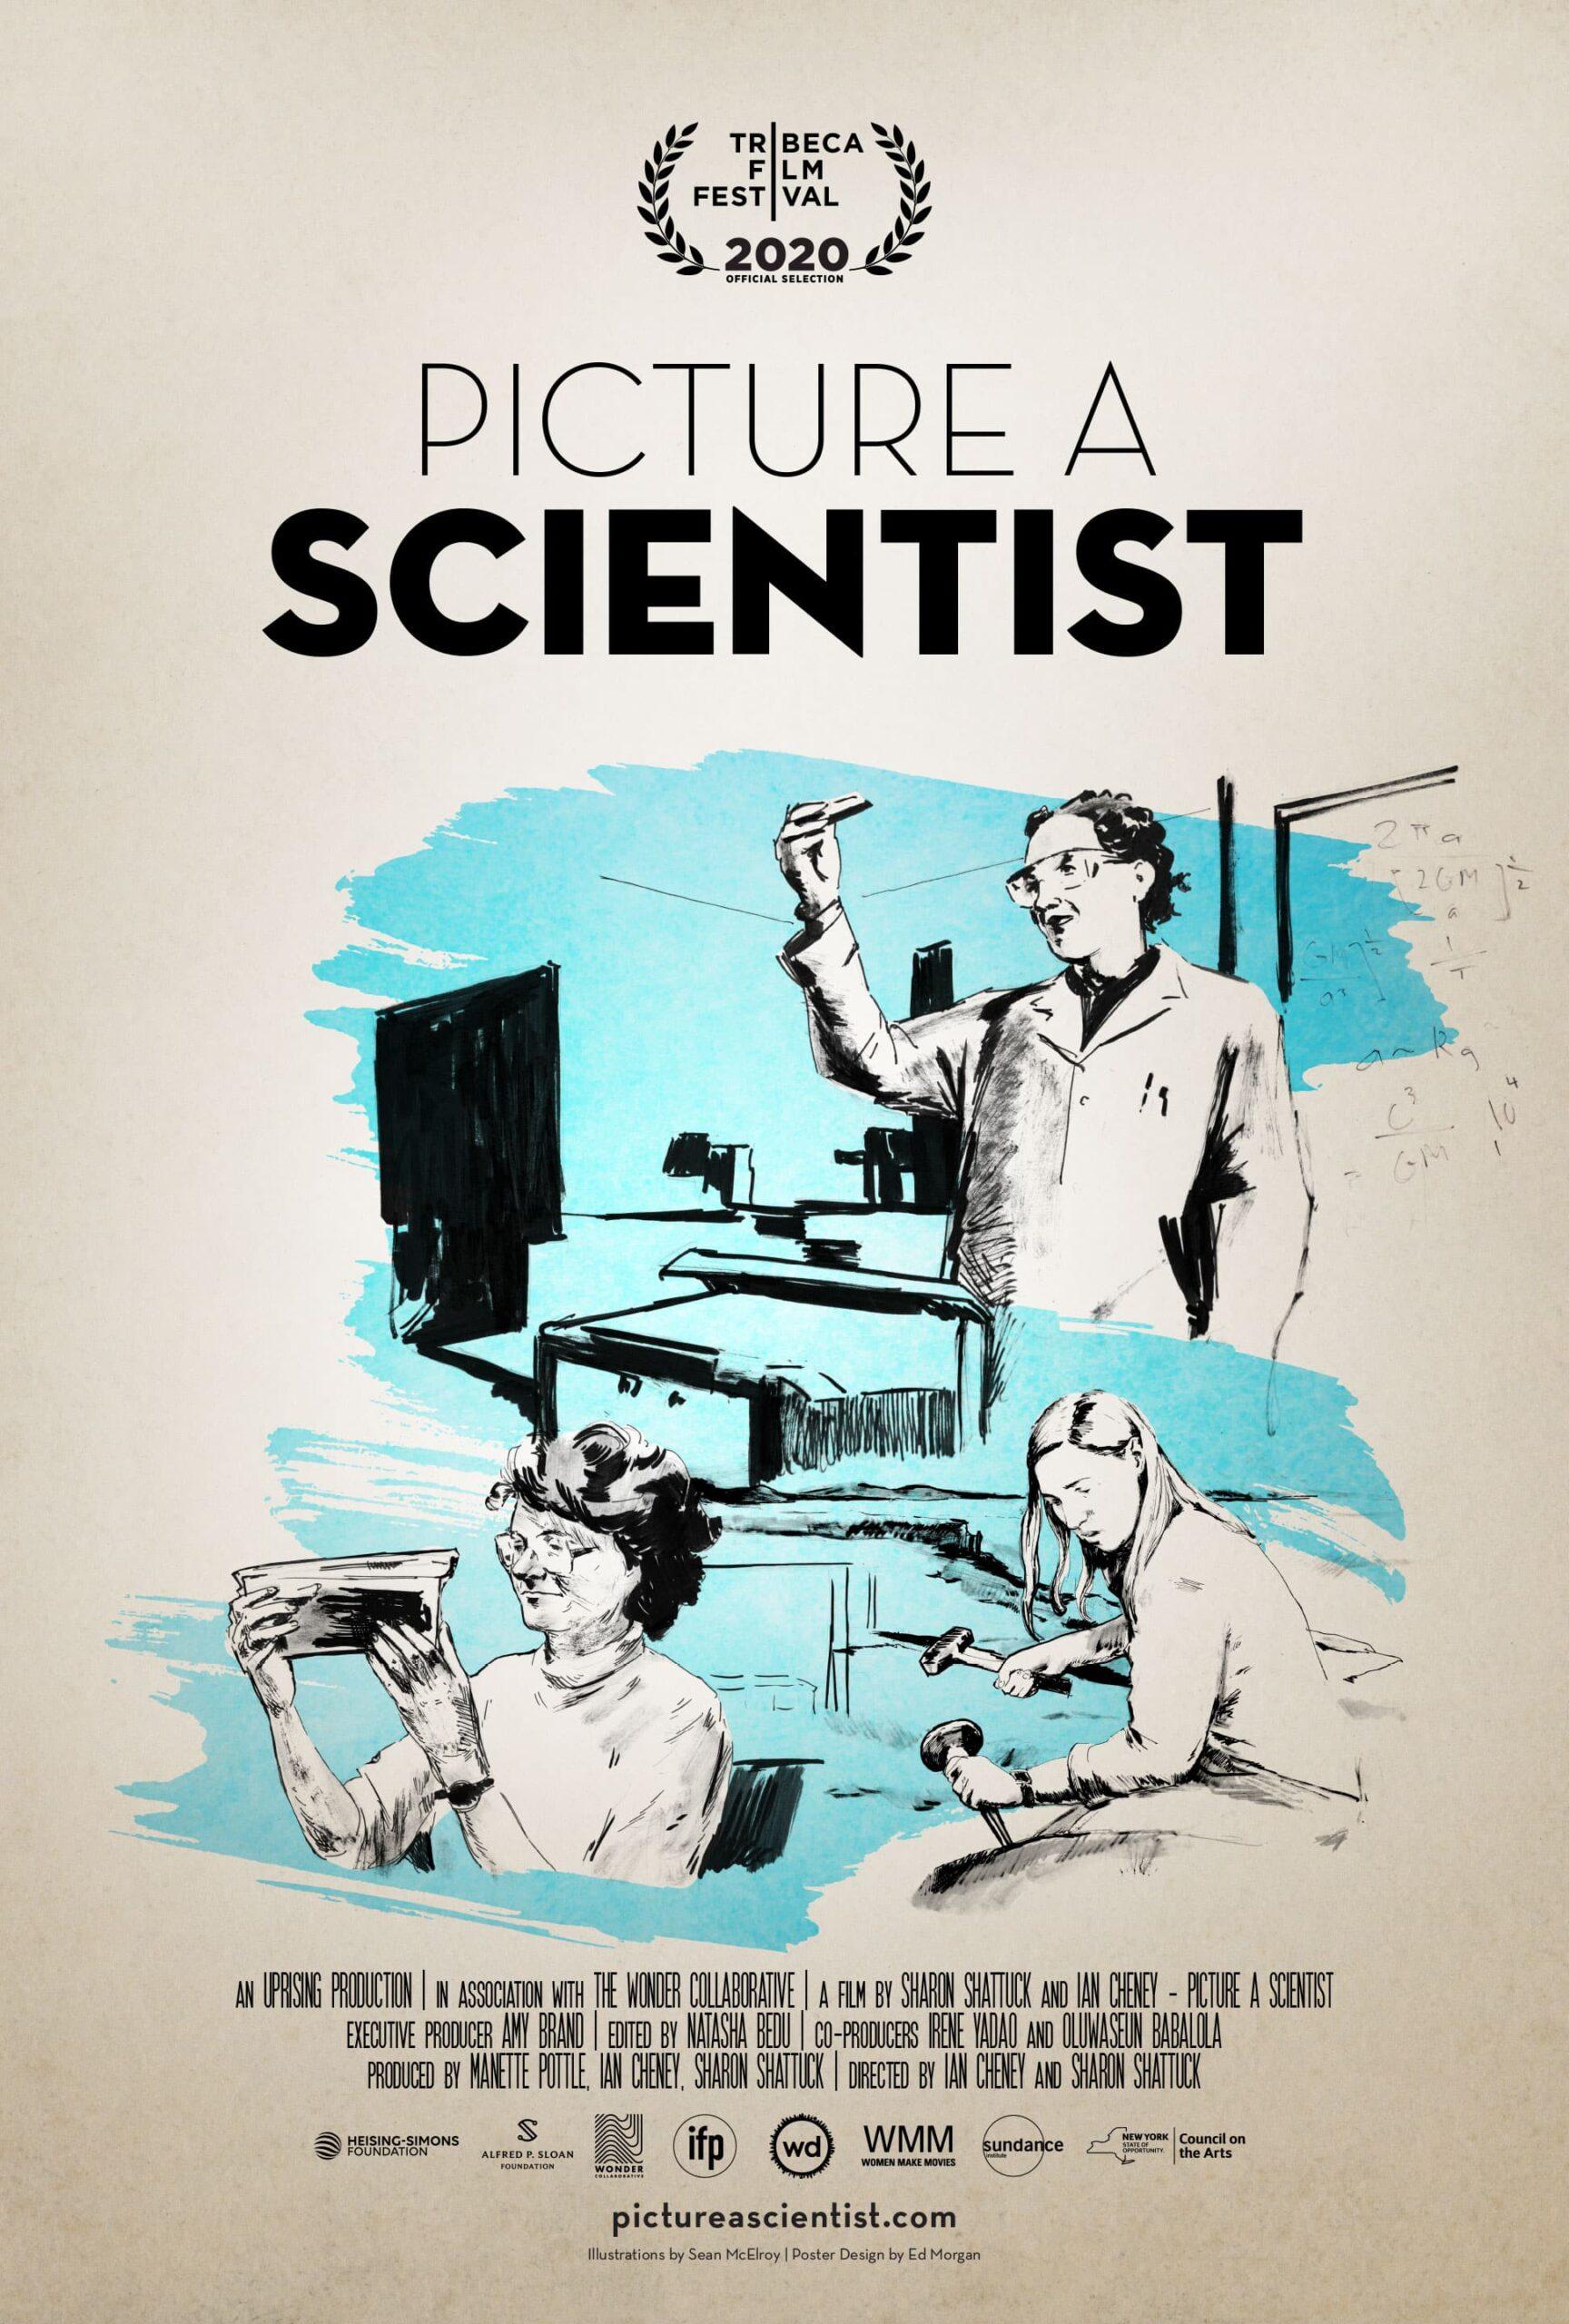 Picture a Scientist - Film Screening - October 4-5, 2020